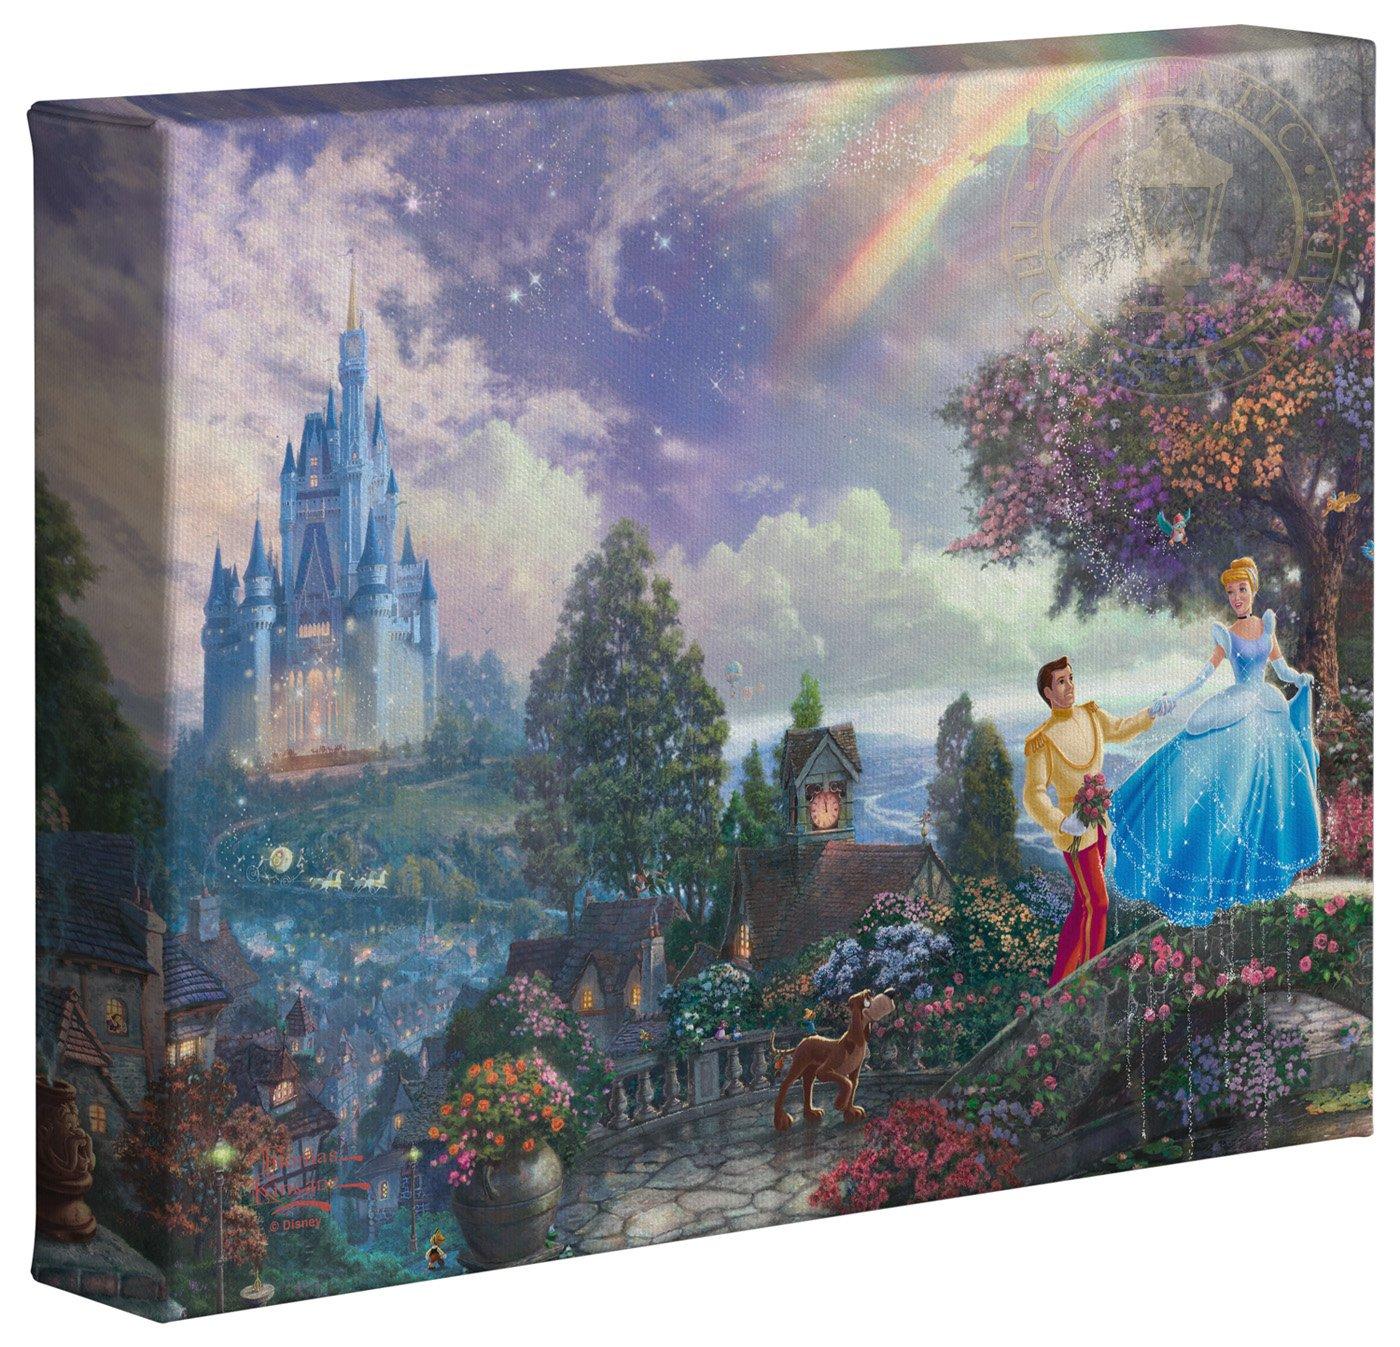 Thomas Kinkade Studios Disney Dumbo 8 x 10 Gallery Wrapped Canvas